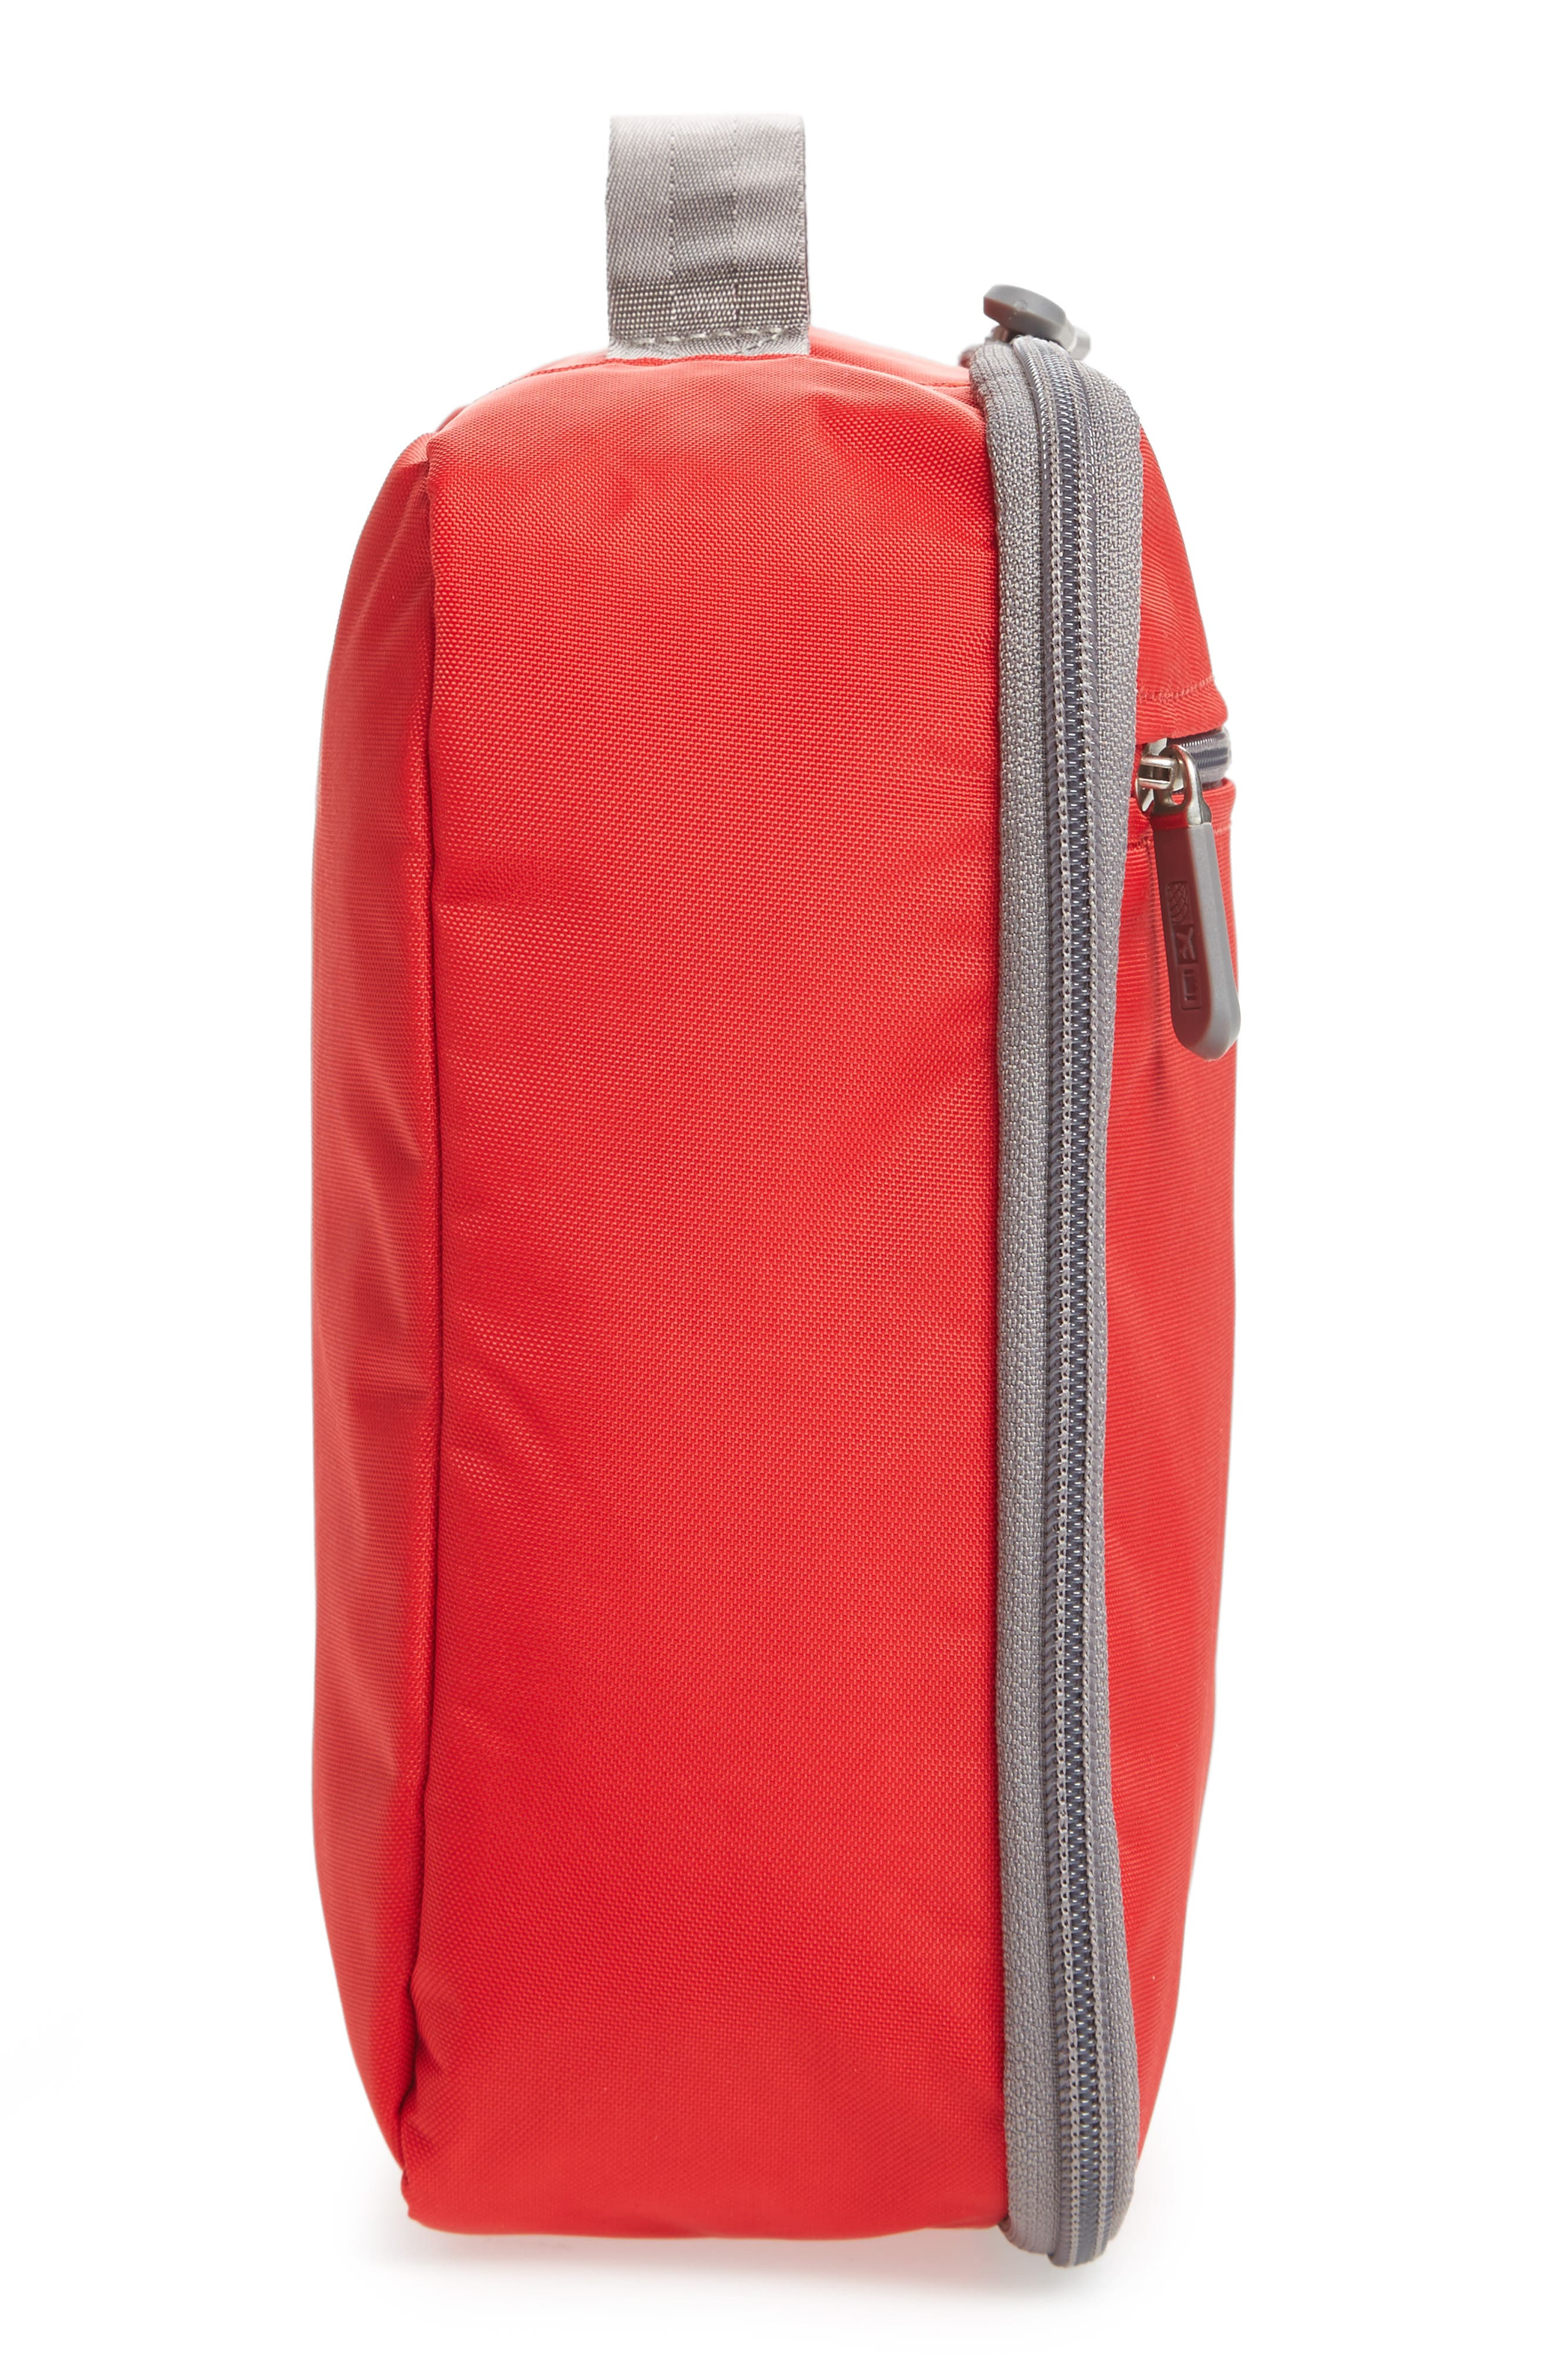 Seat Pak Pro Plane Seat Organizer,                             Alternate thumbnail 4, color,                             Red